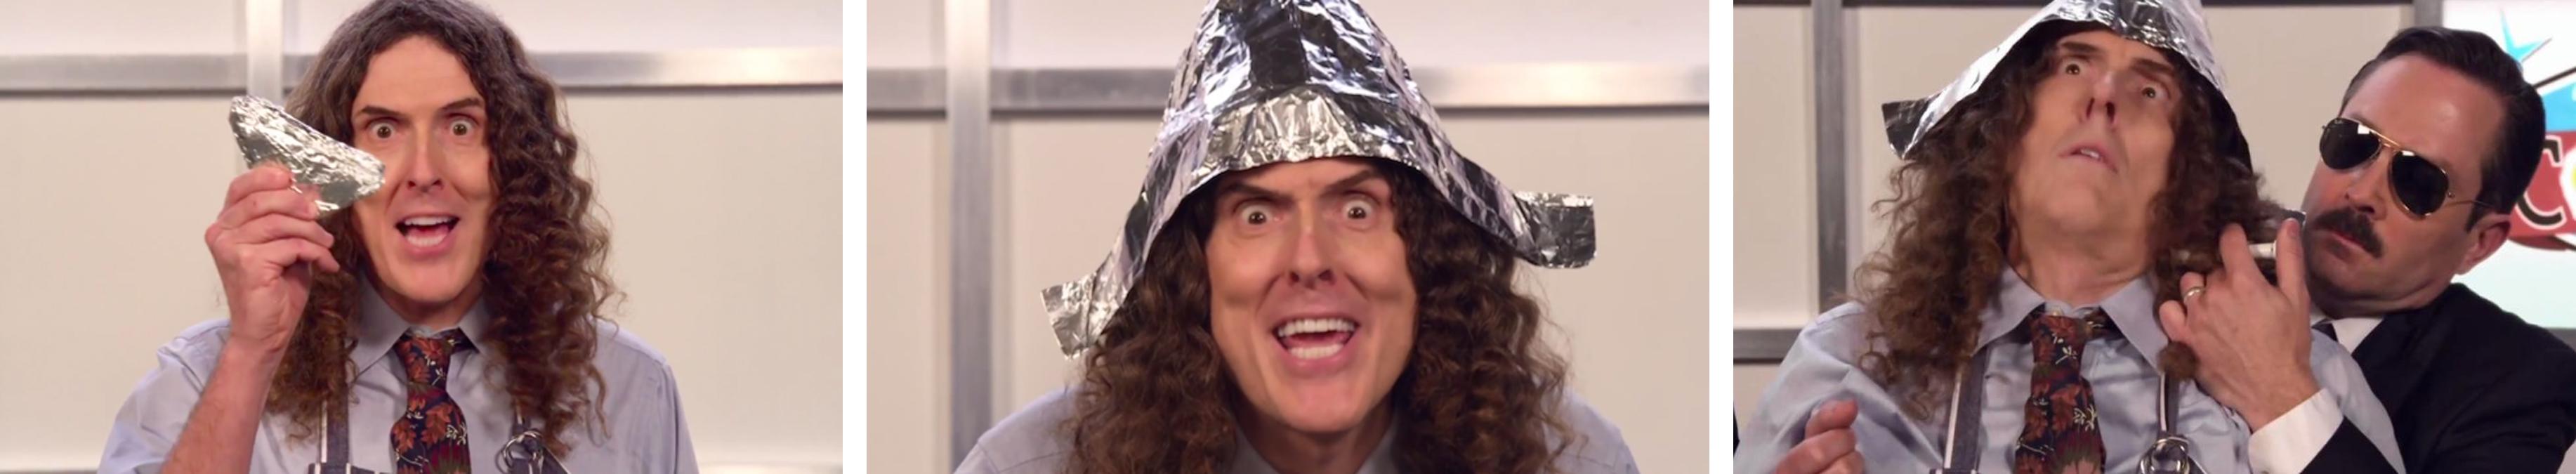 Weird Al Yankovik's tin foil hat video. Conspiracy theory